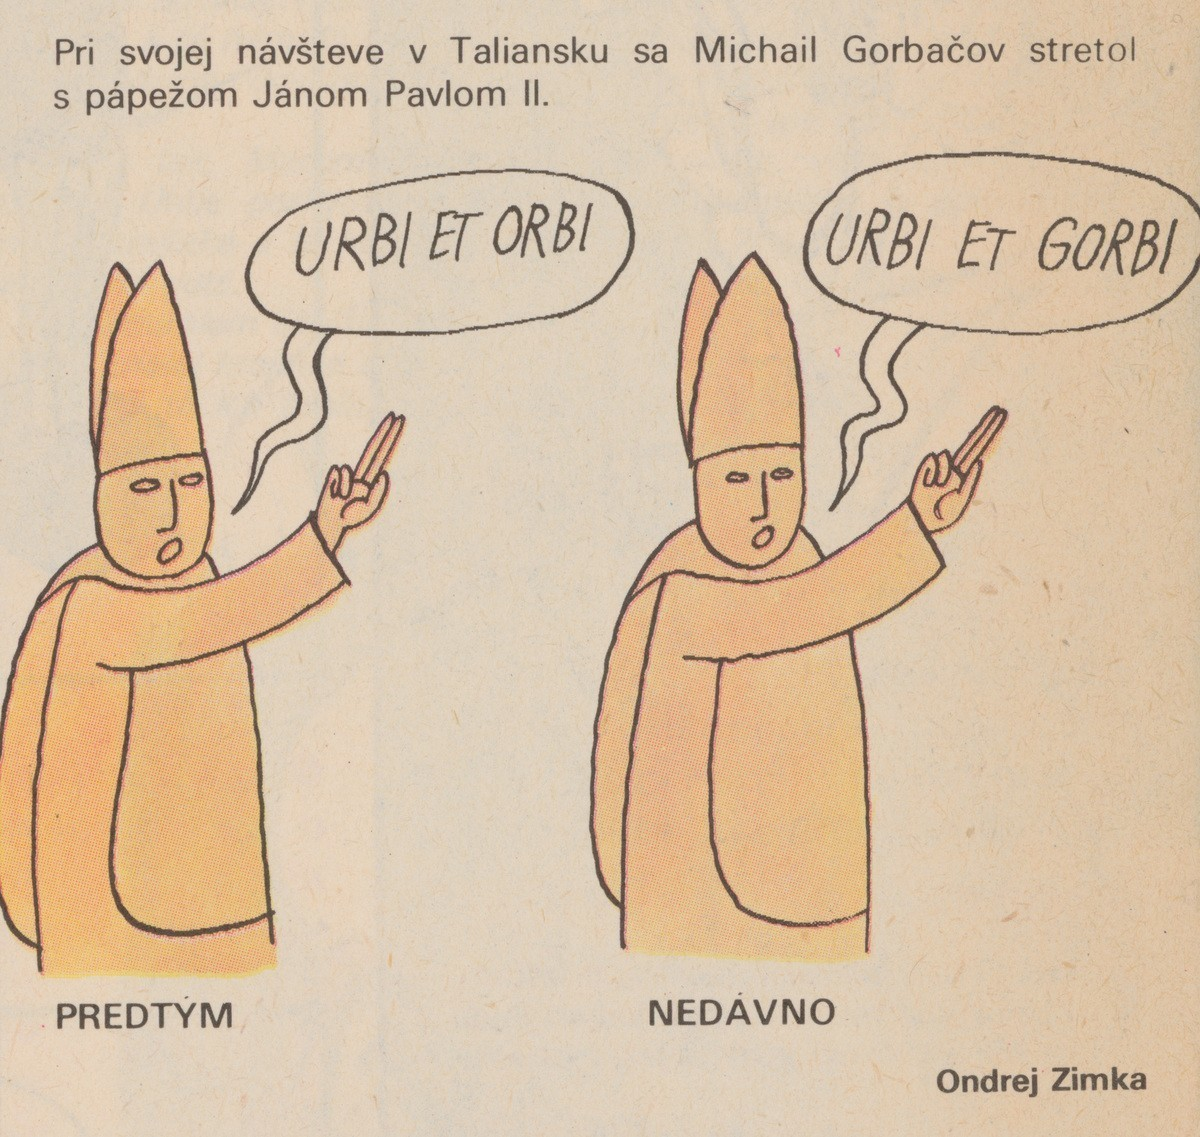 Ondrej Zimka, Urbi et orbi. 1990. Časopis Roháč